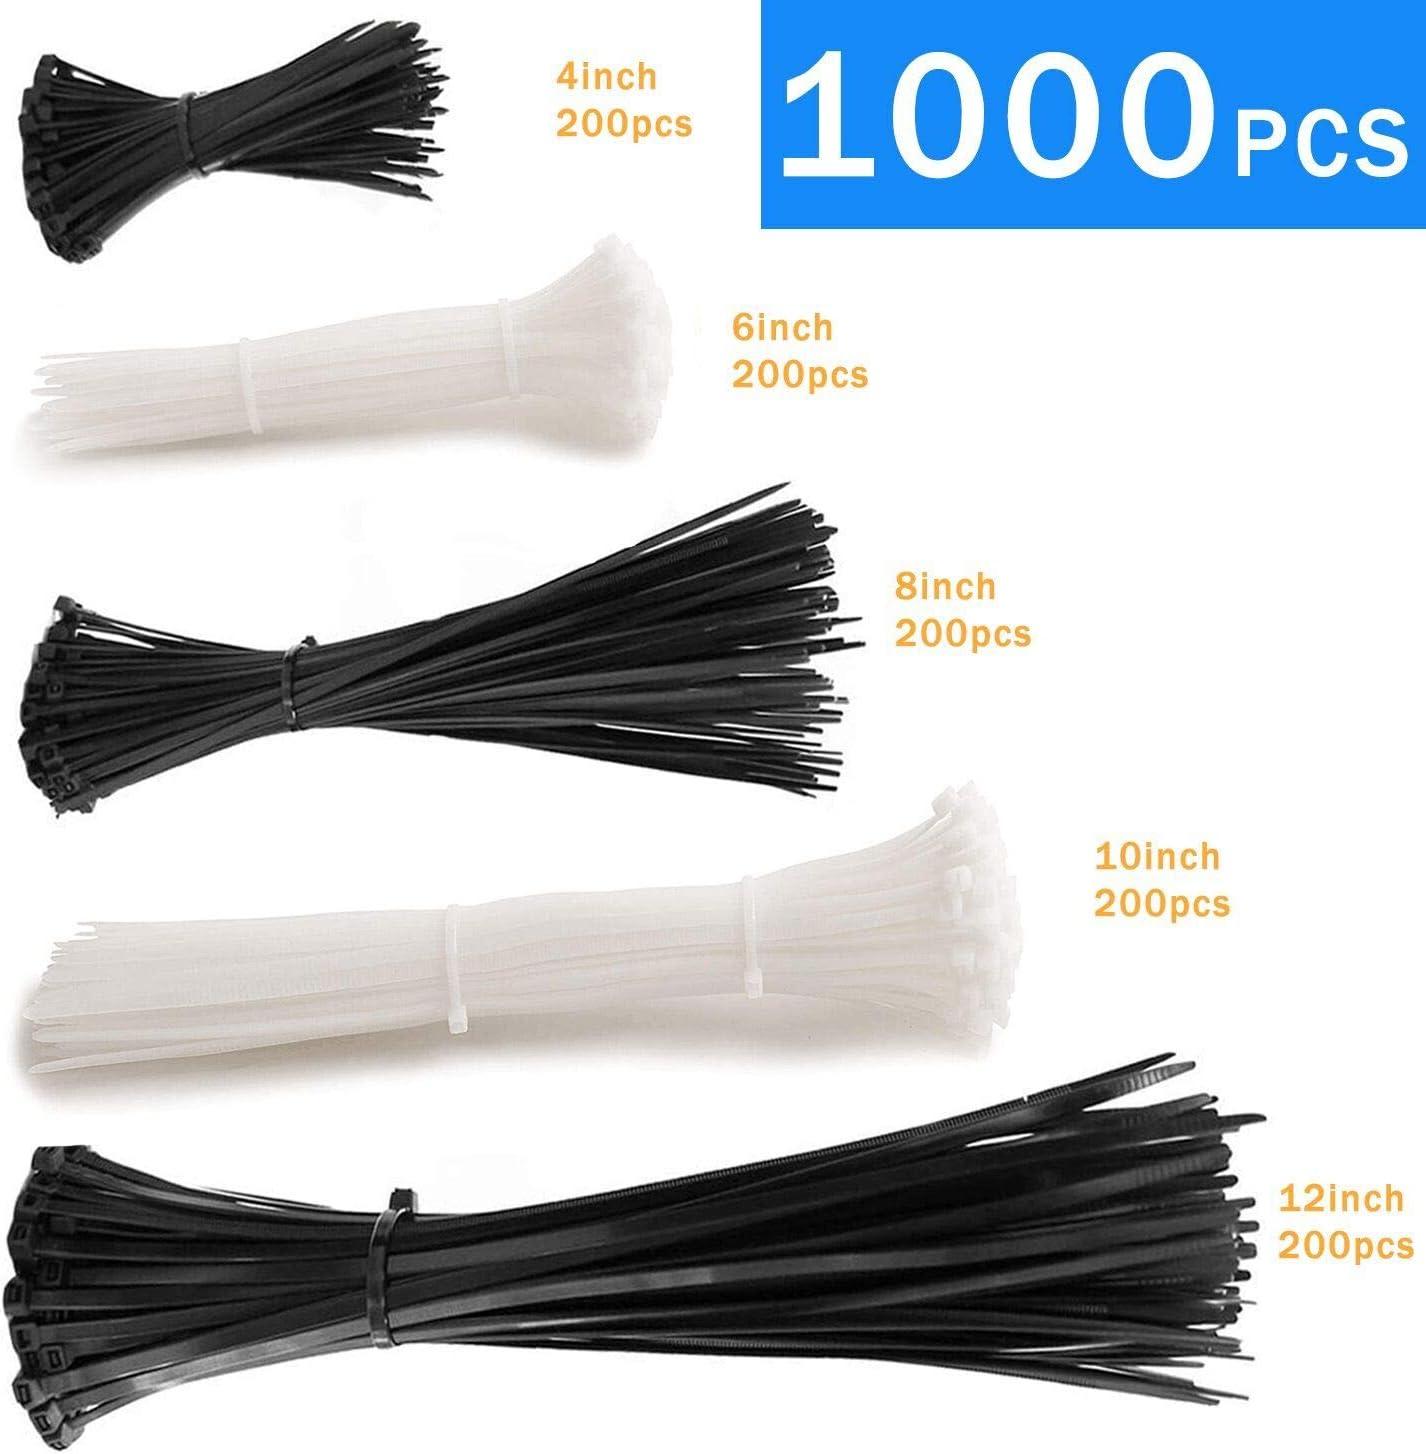 Self-Locking Nylon Plastic Ties Combo Pack Zip Ties Heavy Duty Cable Ties 4+6+8+10+12 Inch Black /& White 1000pcs